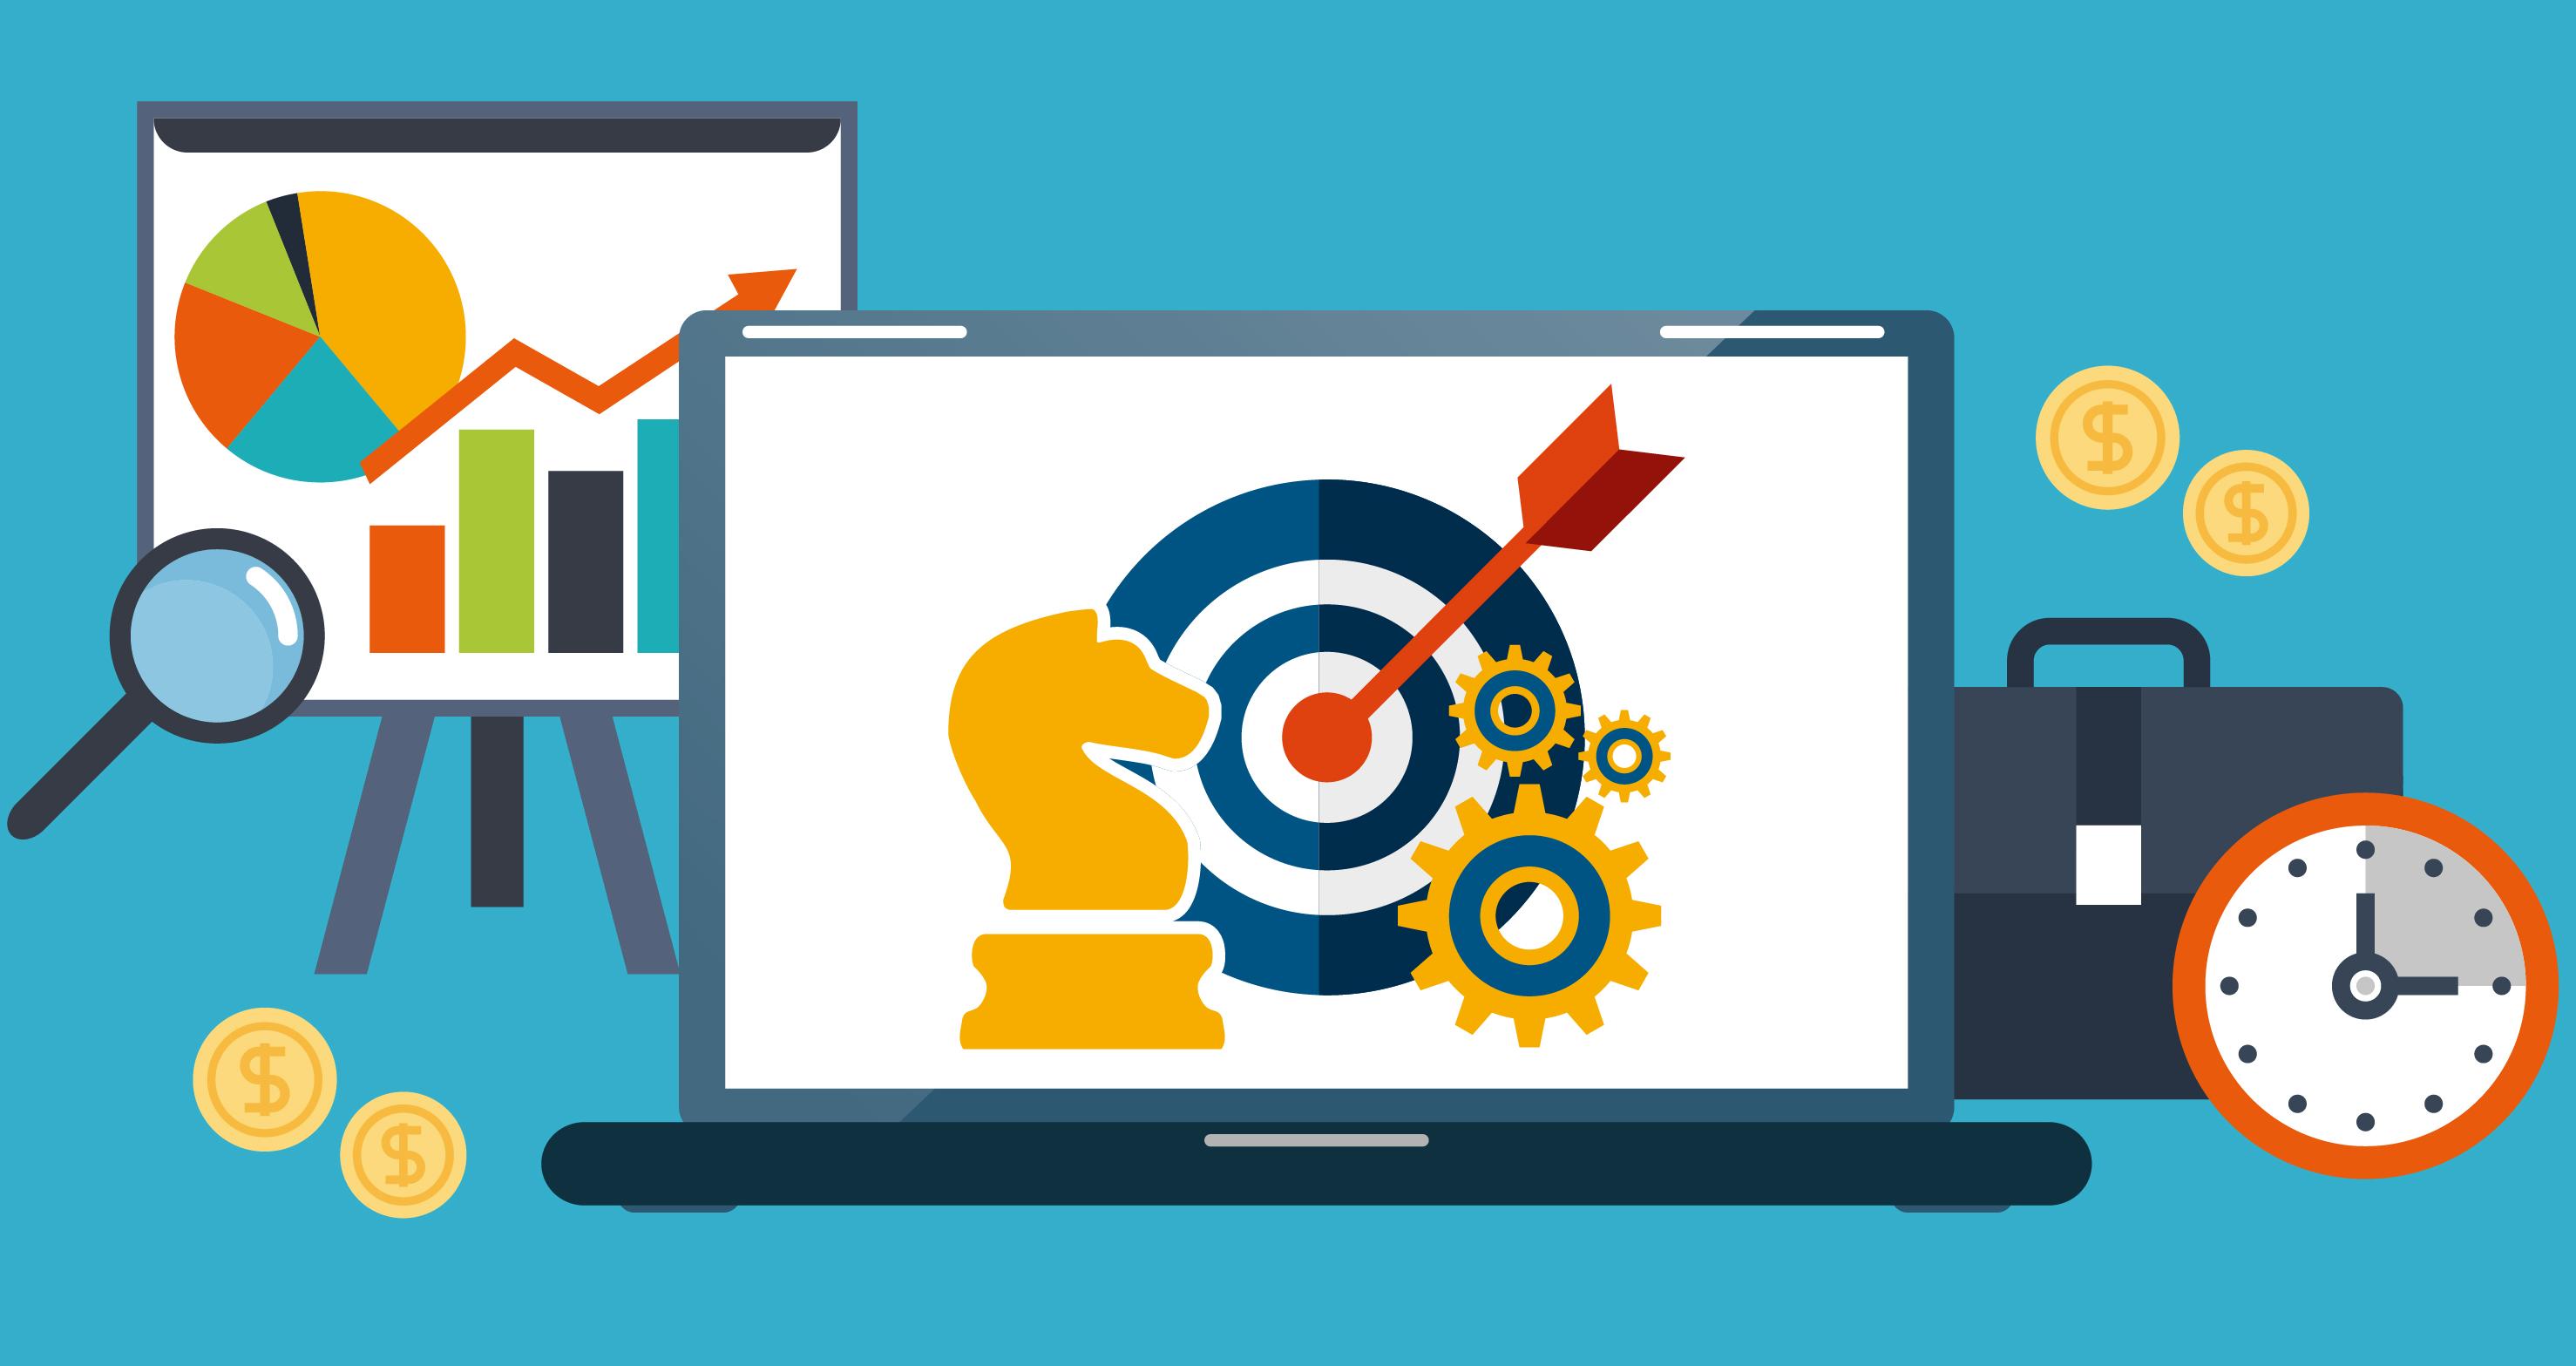 Benchmark Your Company's Innovation Maturity